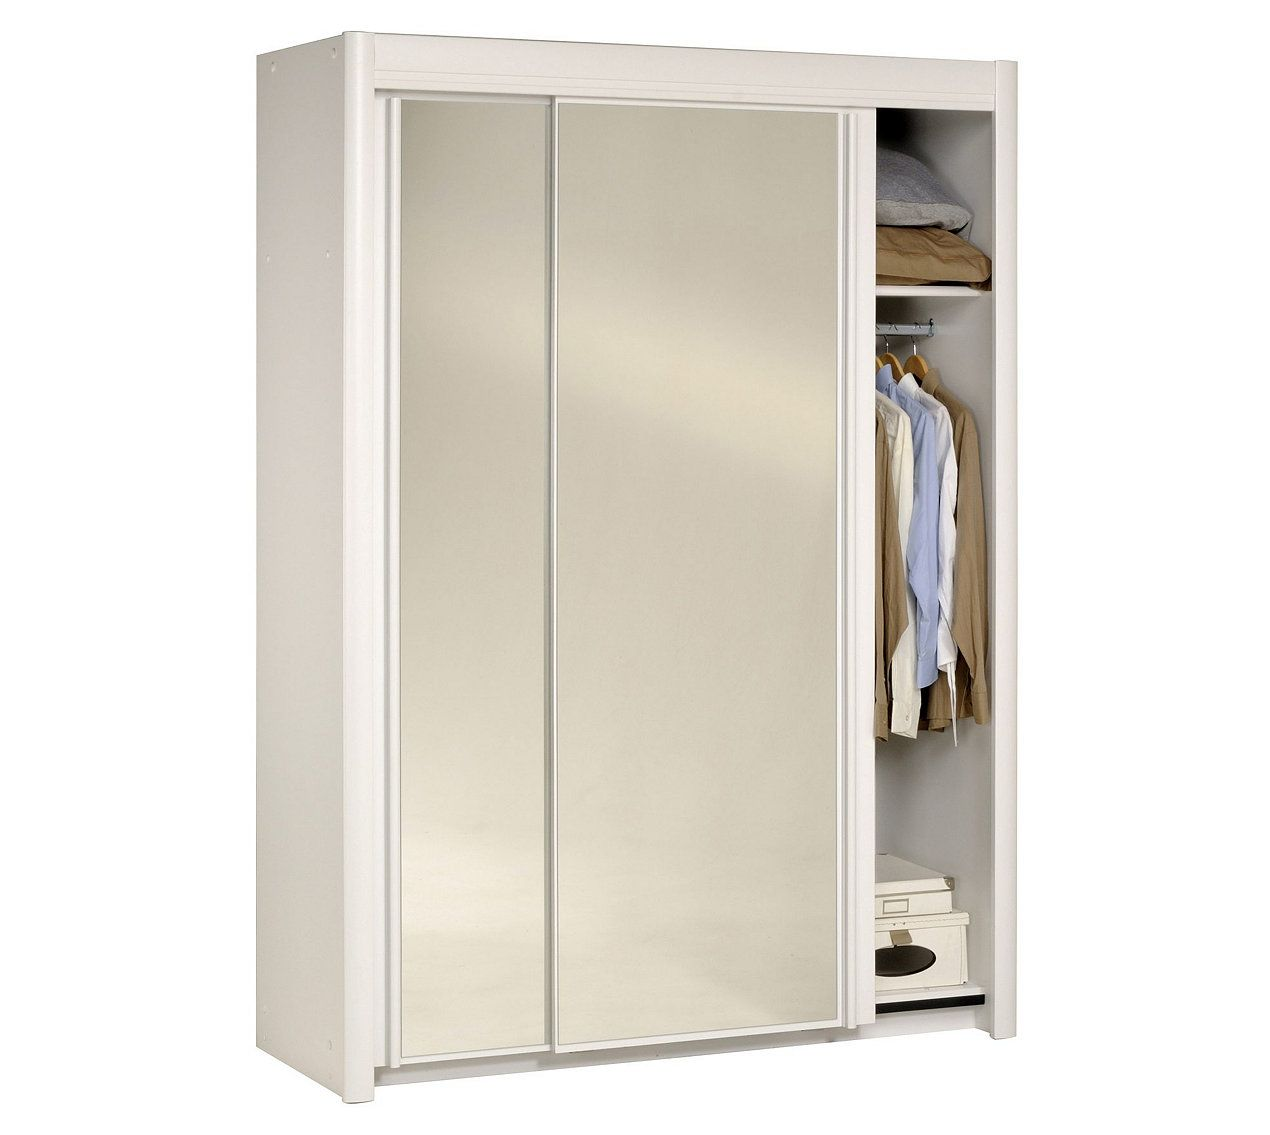 Armoire L.156 cm CARLA 2 4973R161 Blanc - Armoires BUT | ma chambre ...